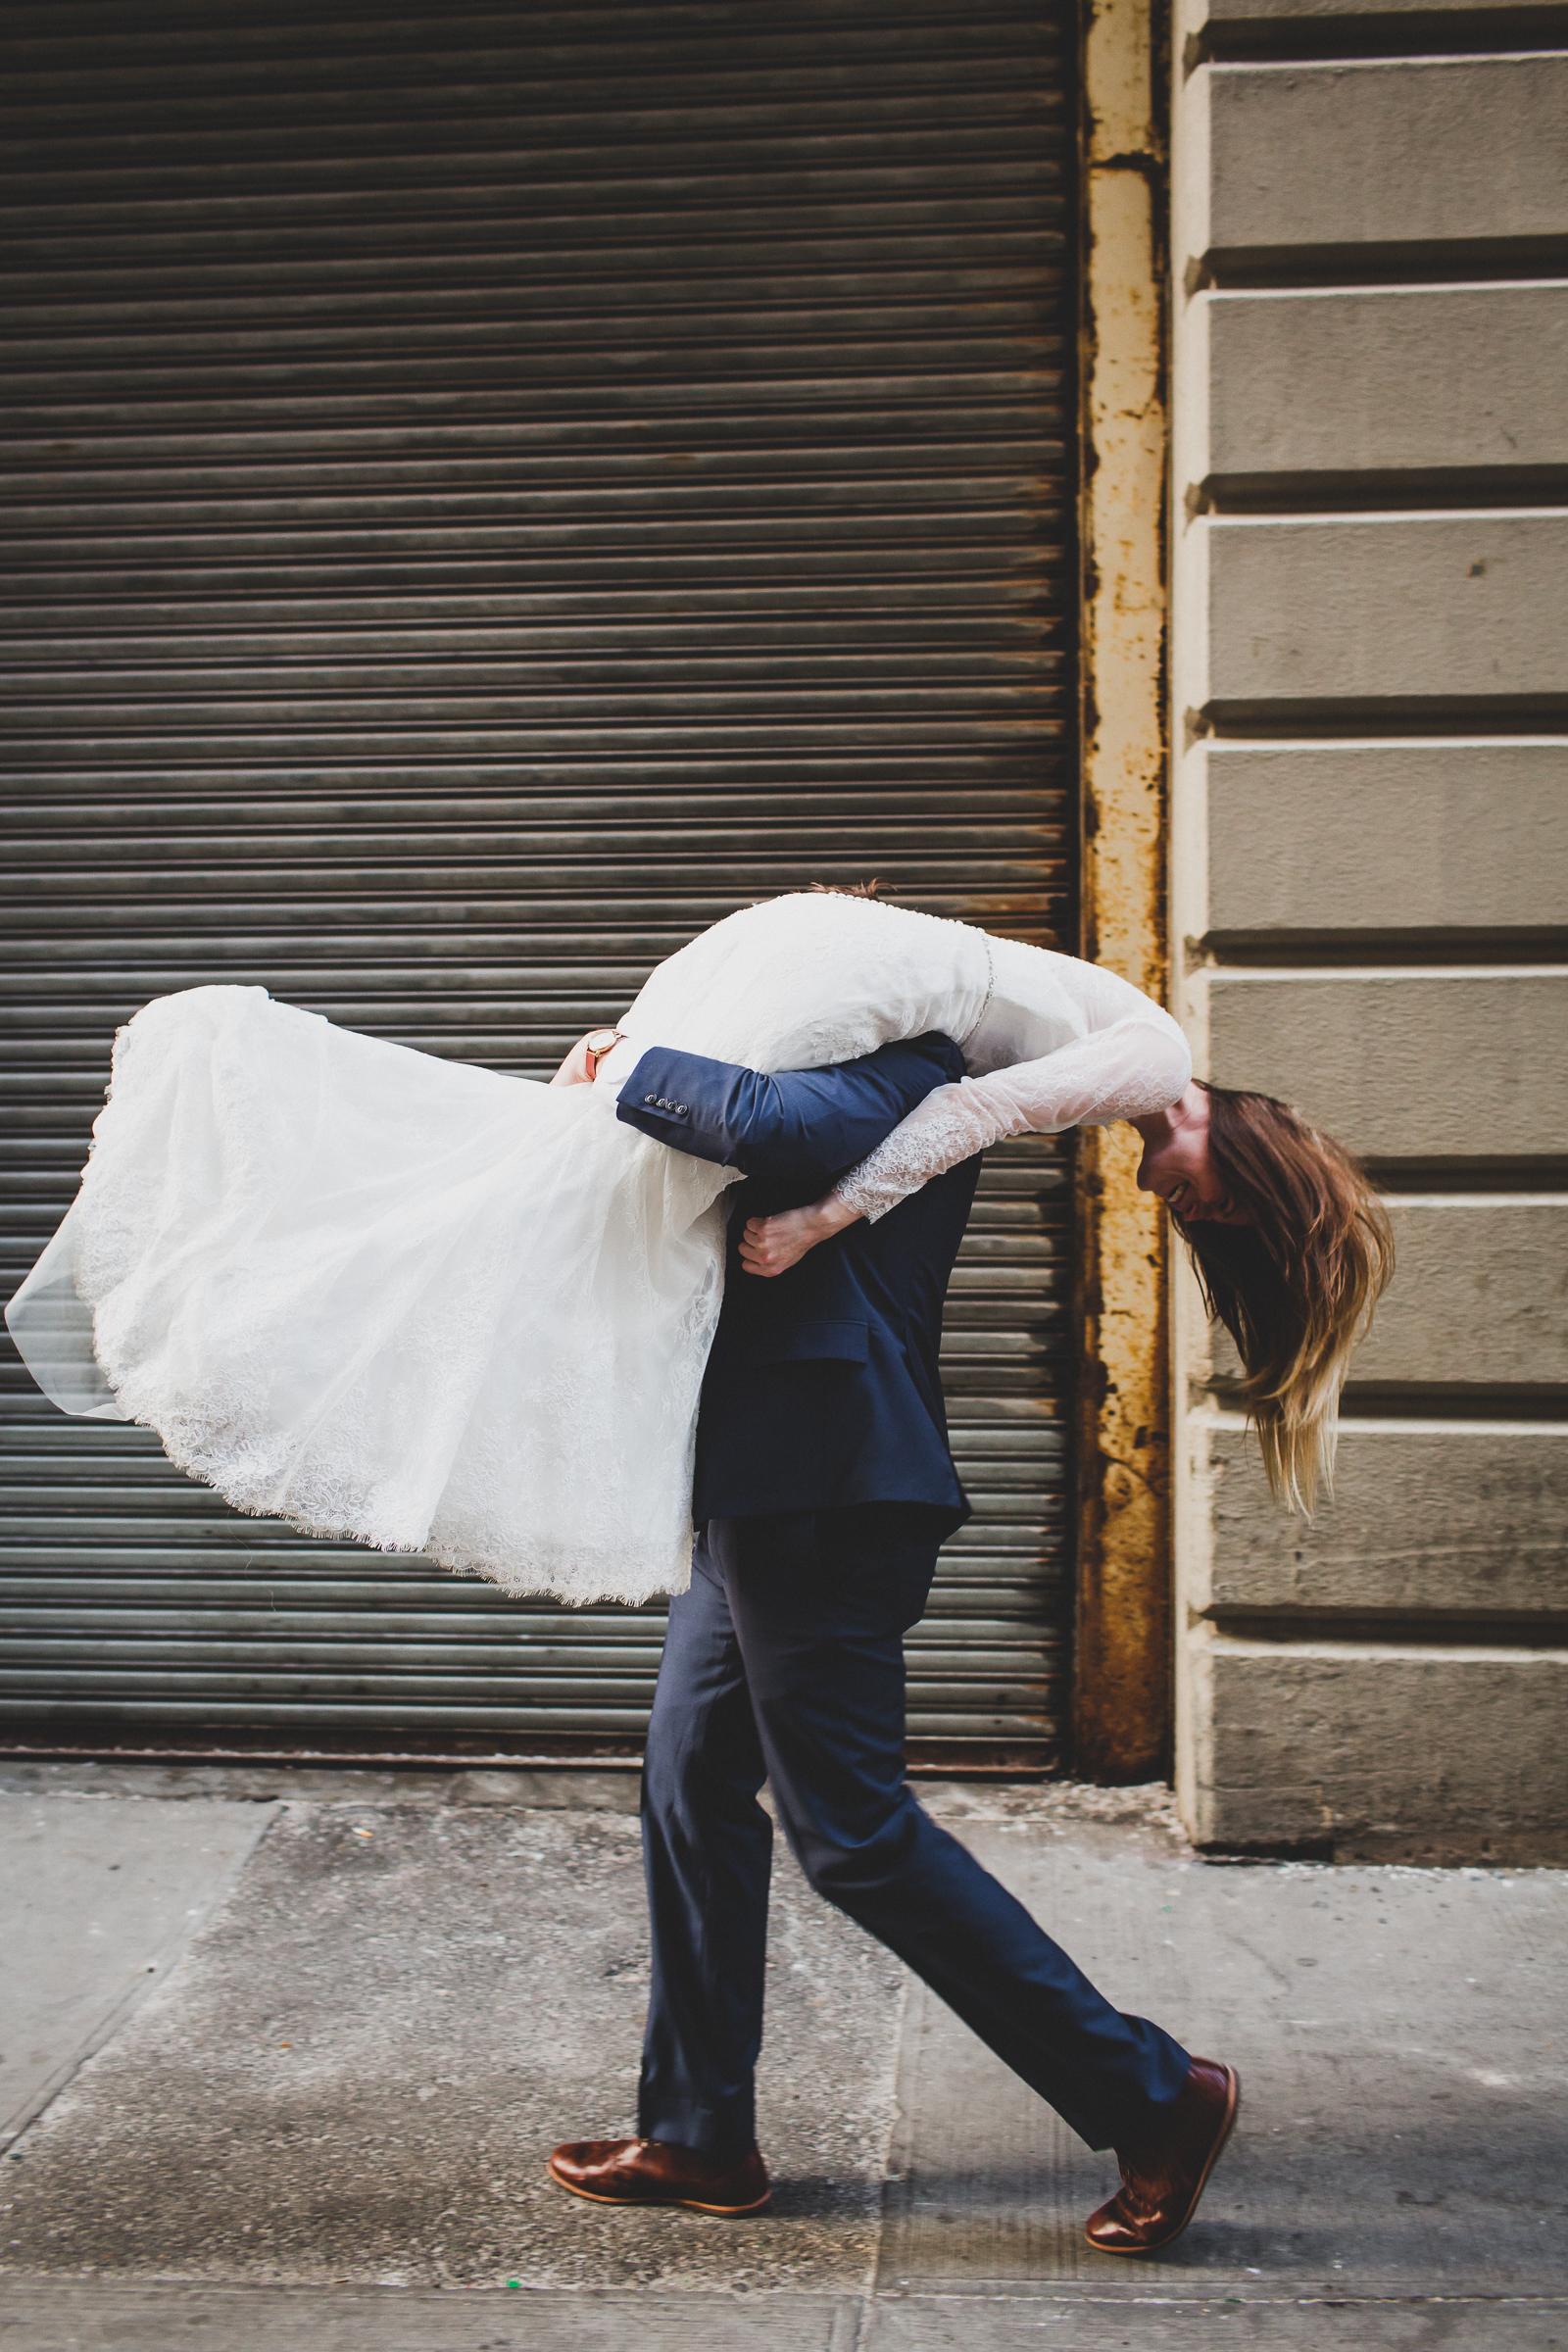 New-York-Documentary-Wedding-Photography-Best-Of-2017-by-Elvira-Kalviste-Photography-59.jpg